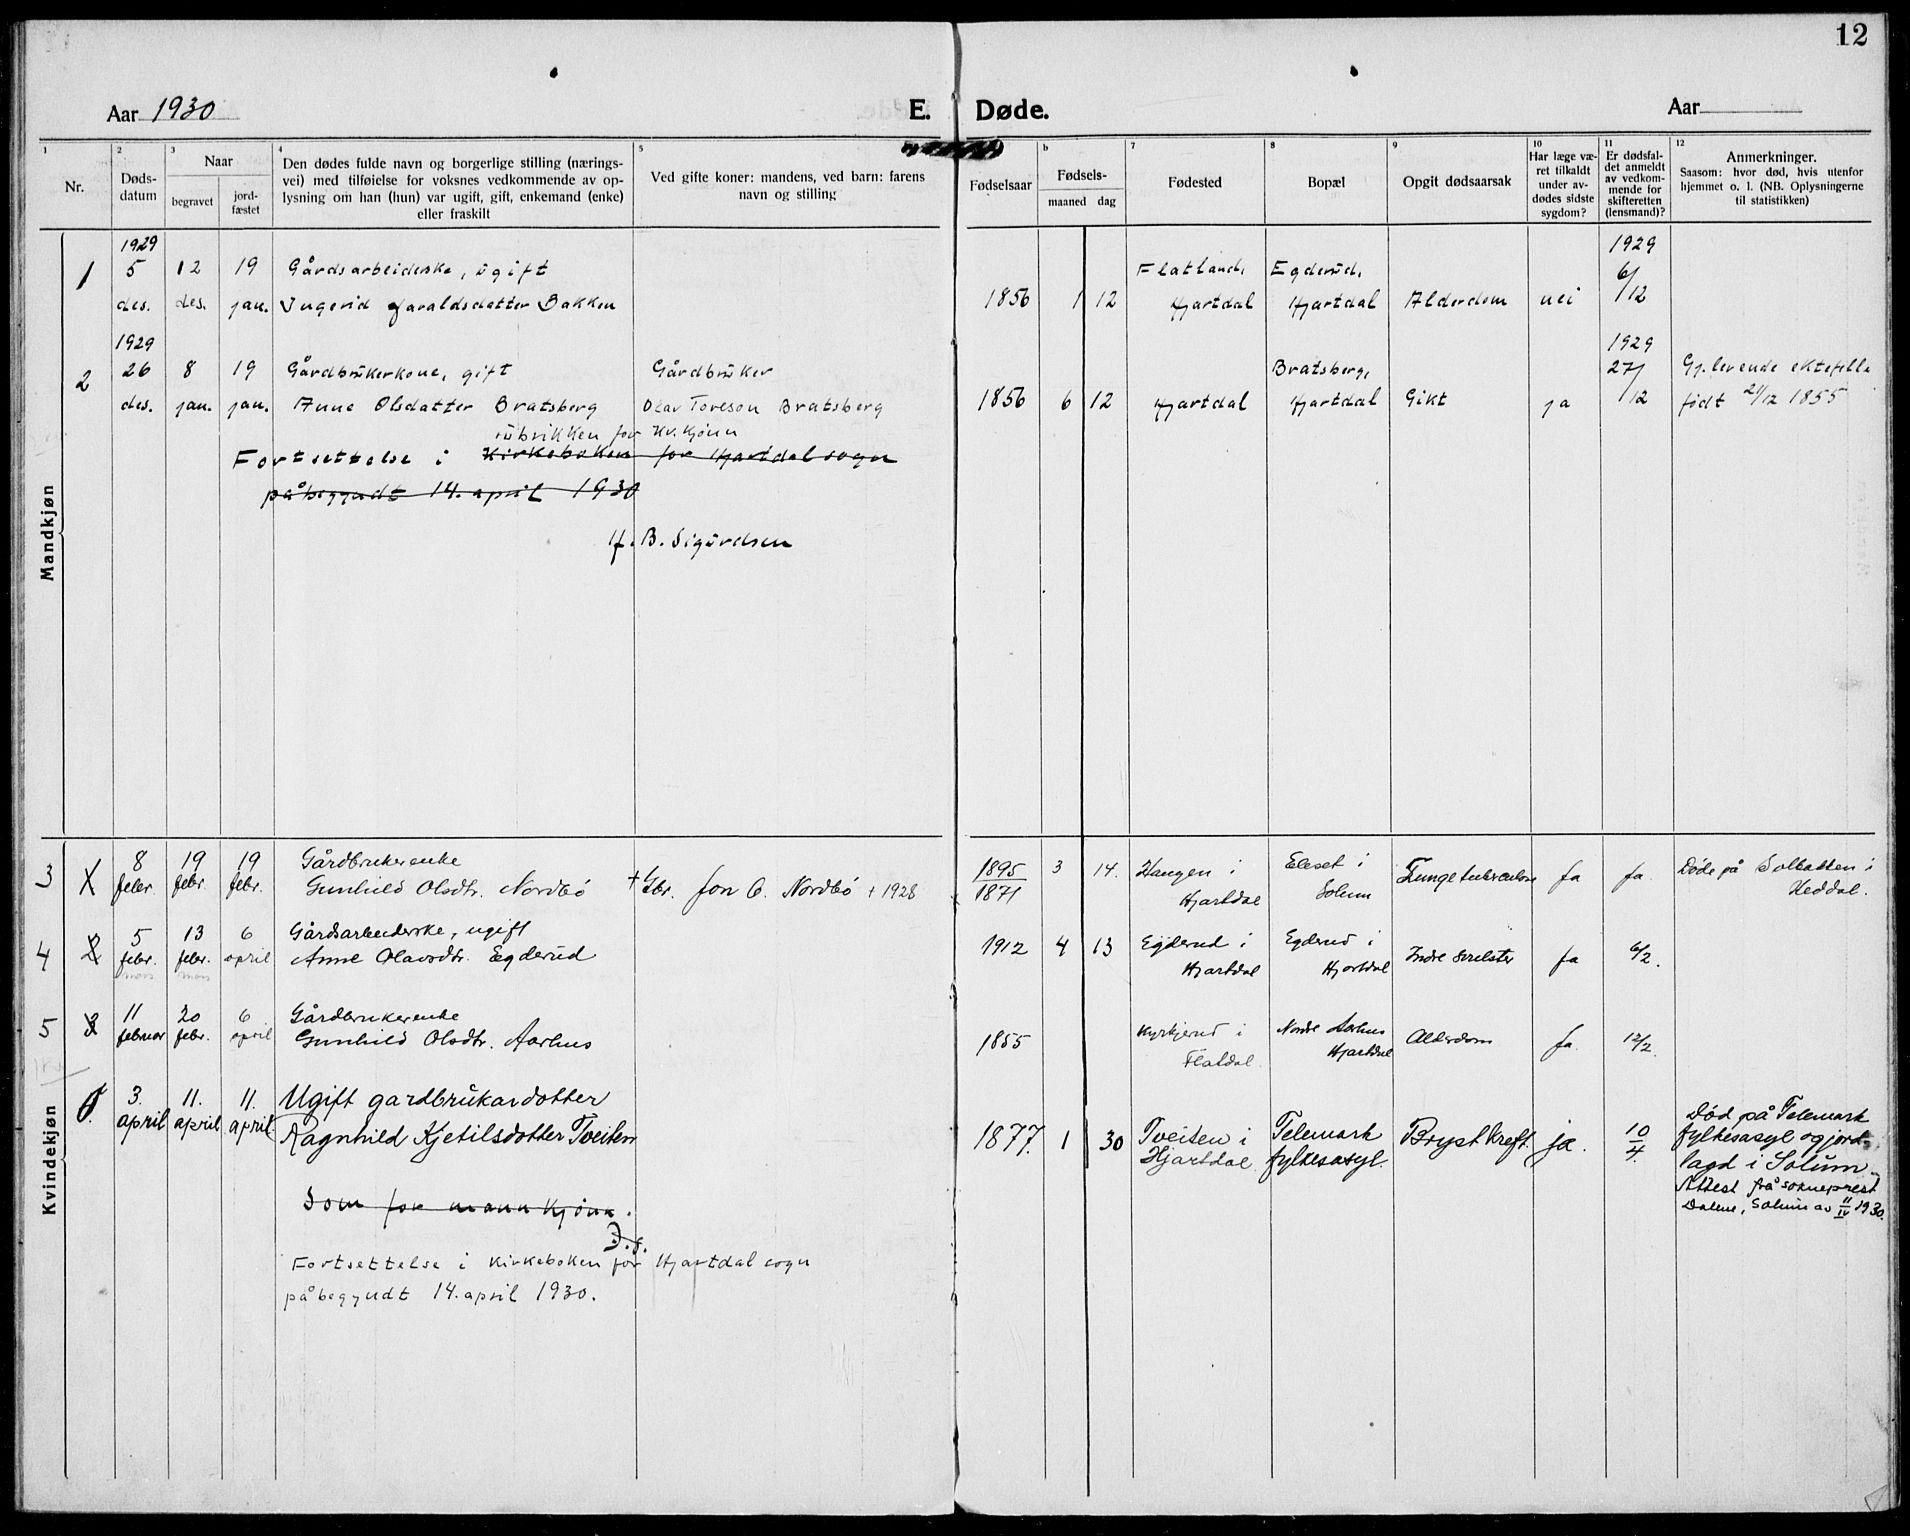 SAKO, Hjartdal kirkebøker, F/Fa/L0012: Ministerialbok nr. I 12, 1923-1930, s. 12